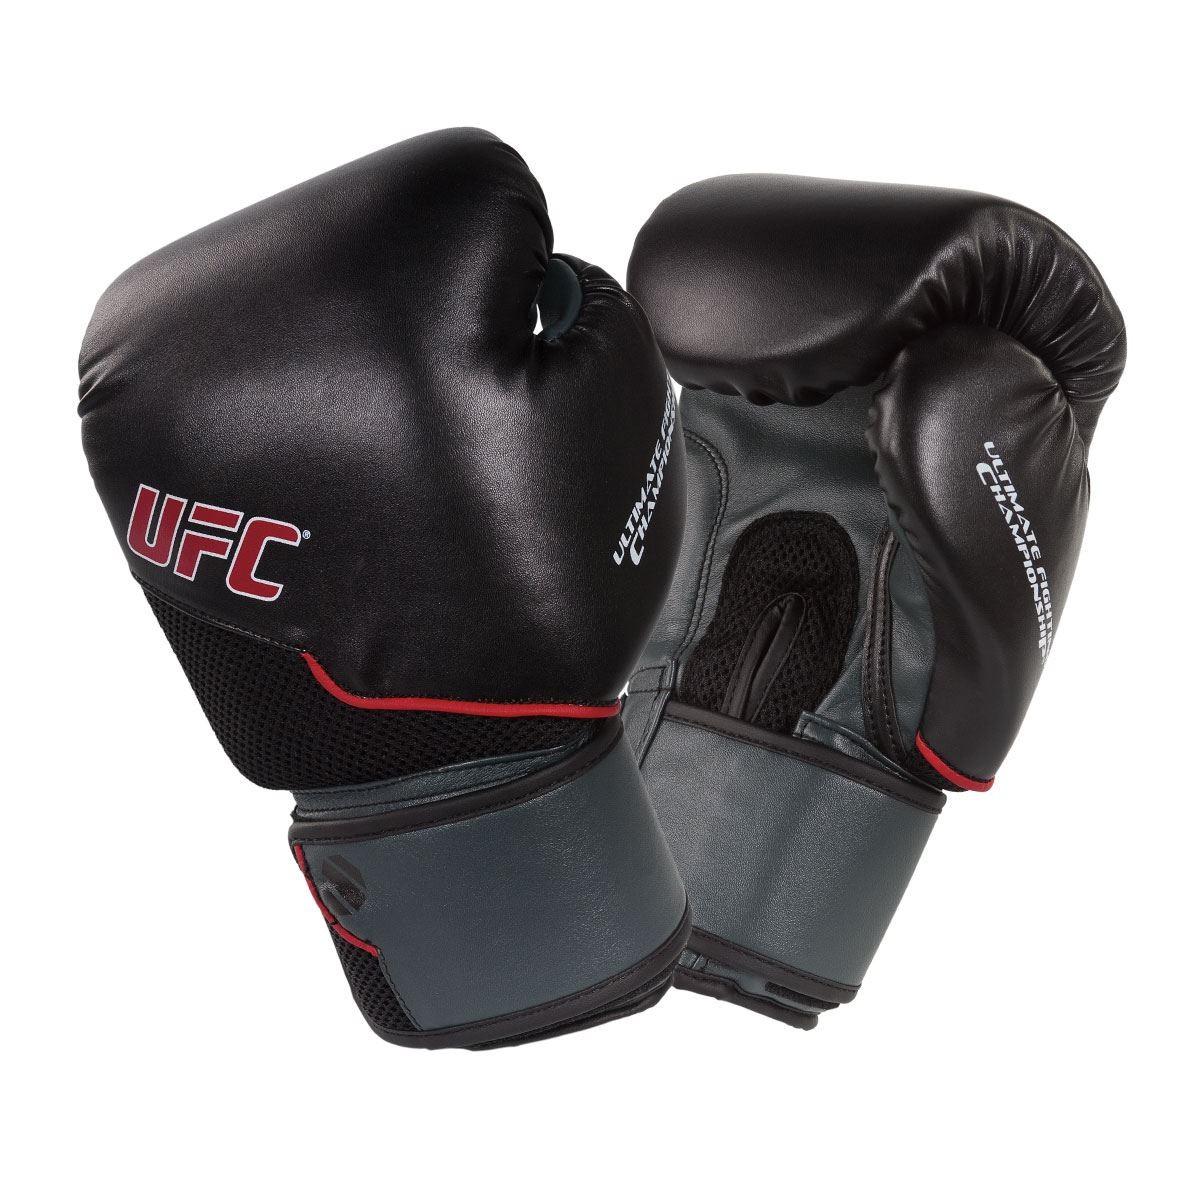 UFC Muay Thai Boxing 12oz Gloves